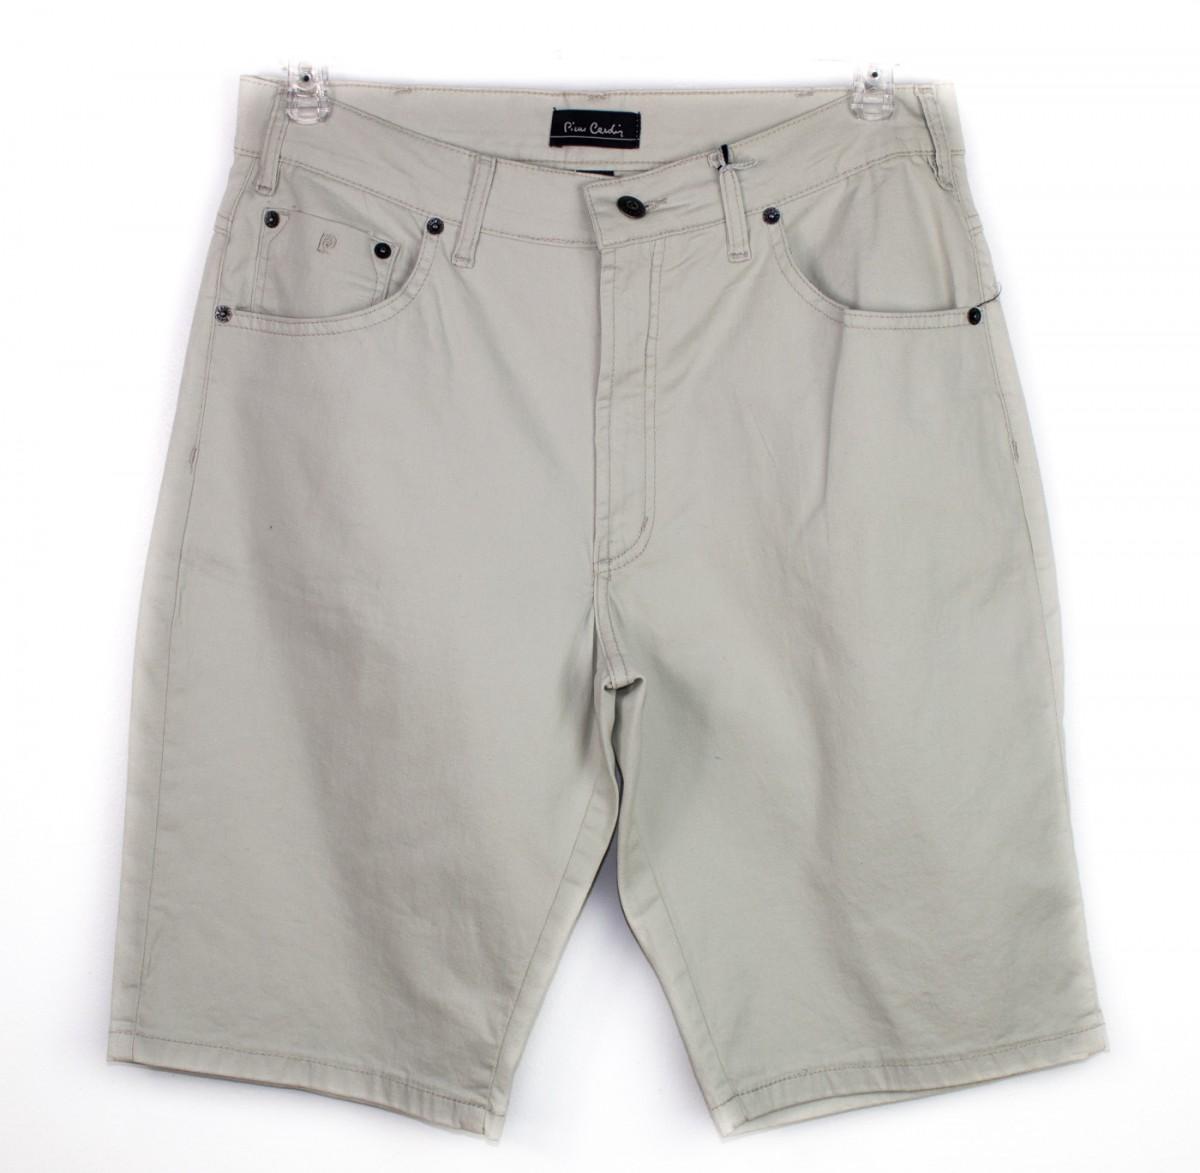 59465f58d Bizz Store - Bermuda Masculina Pierre Cardin Jeans Sarja Bege